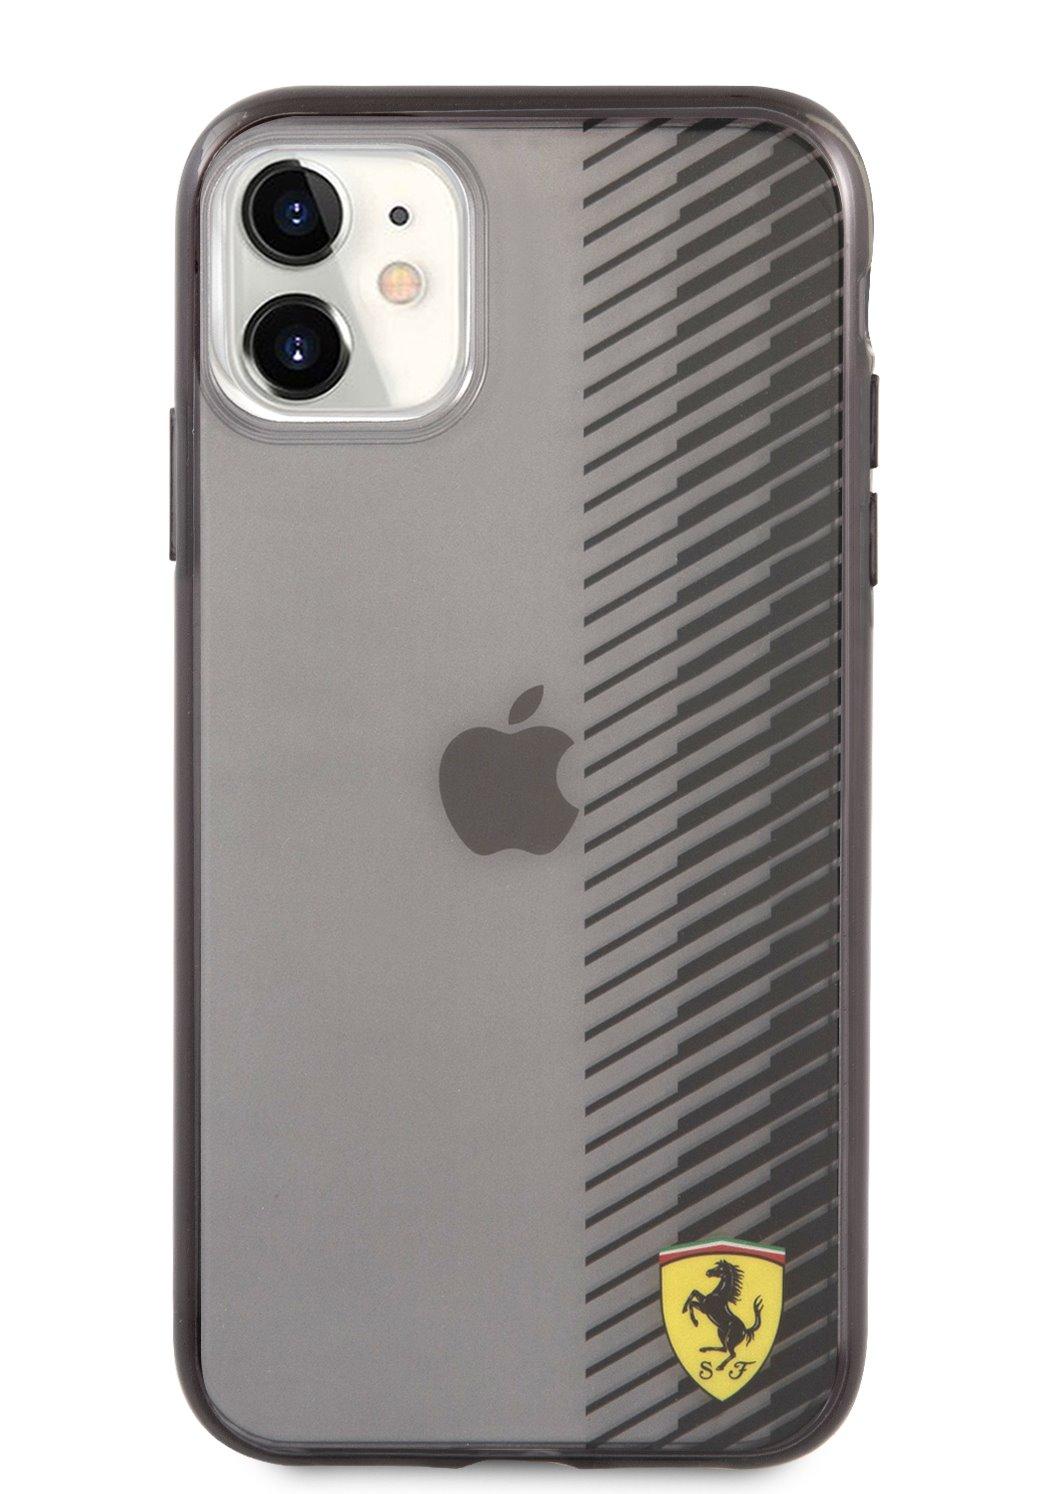 FEHCN61UYEK Ferrari On Track Gradient Kryt pro iPhone 11 Black 3666339017064